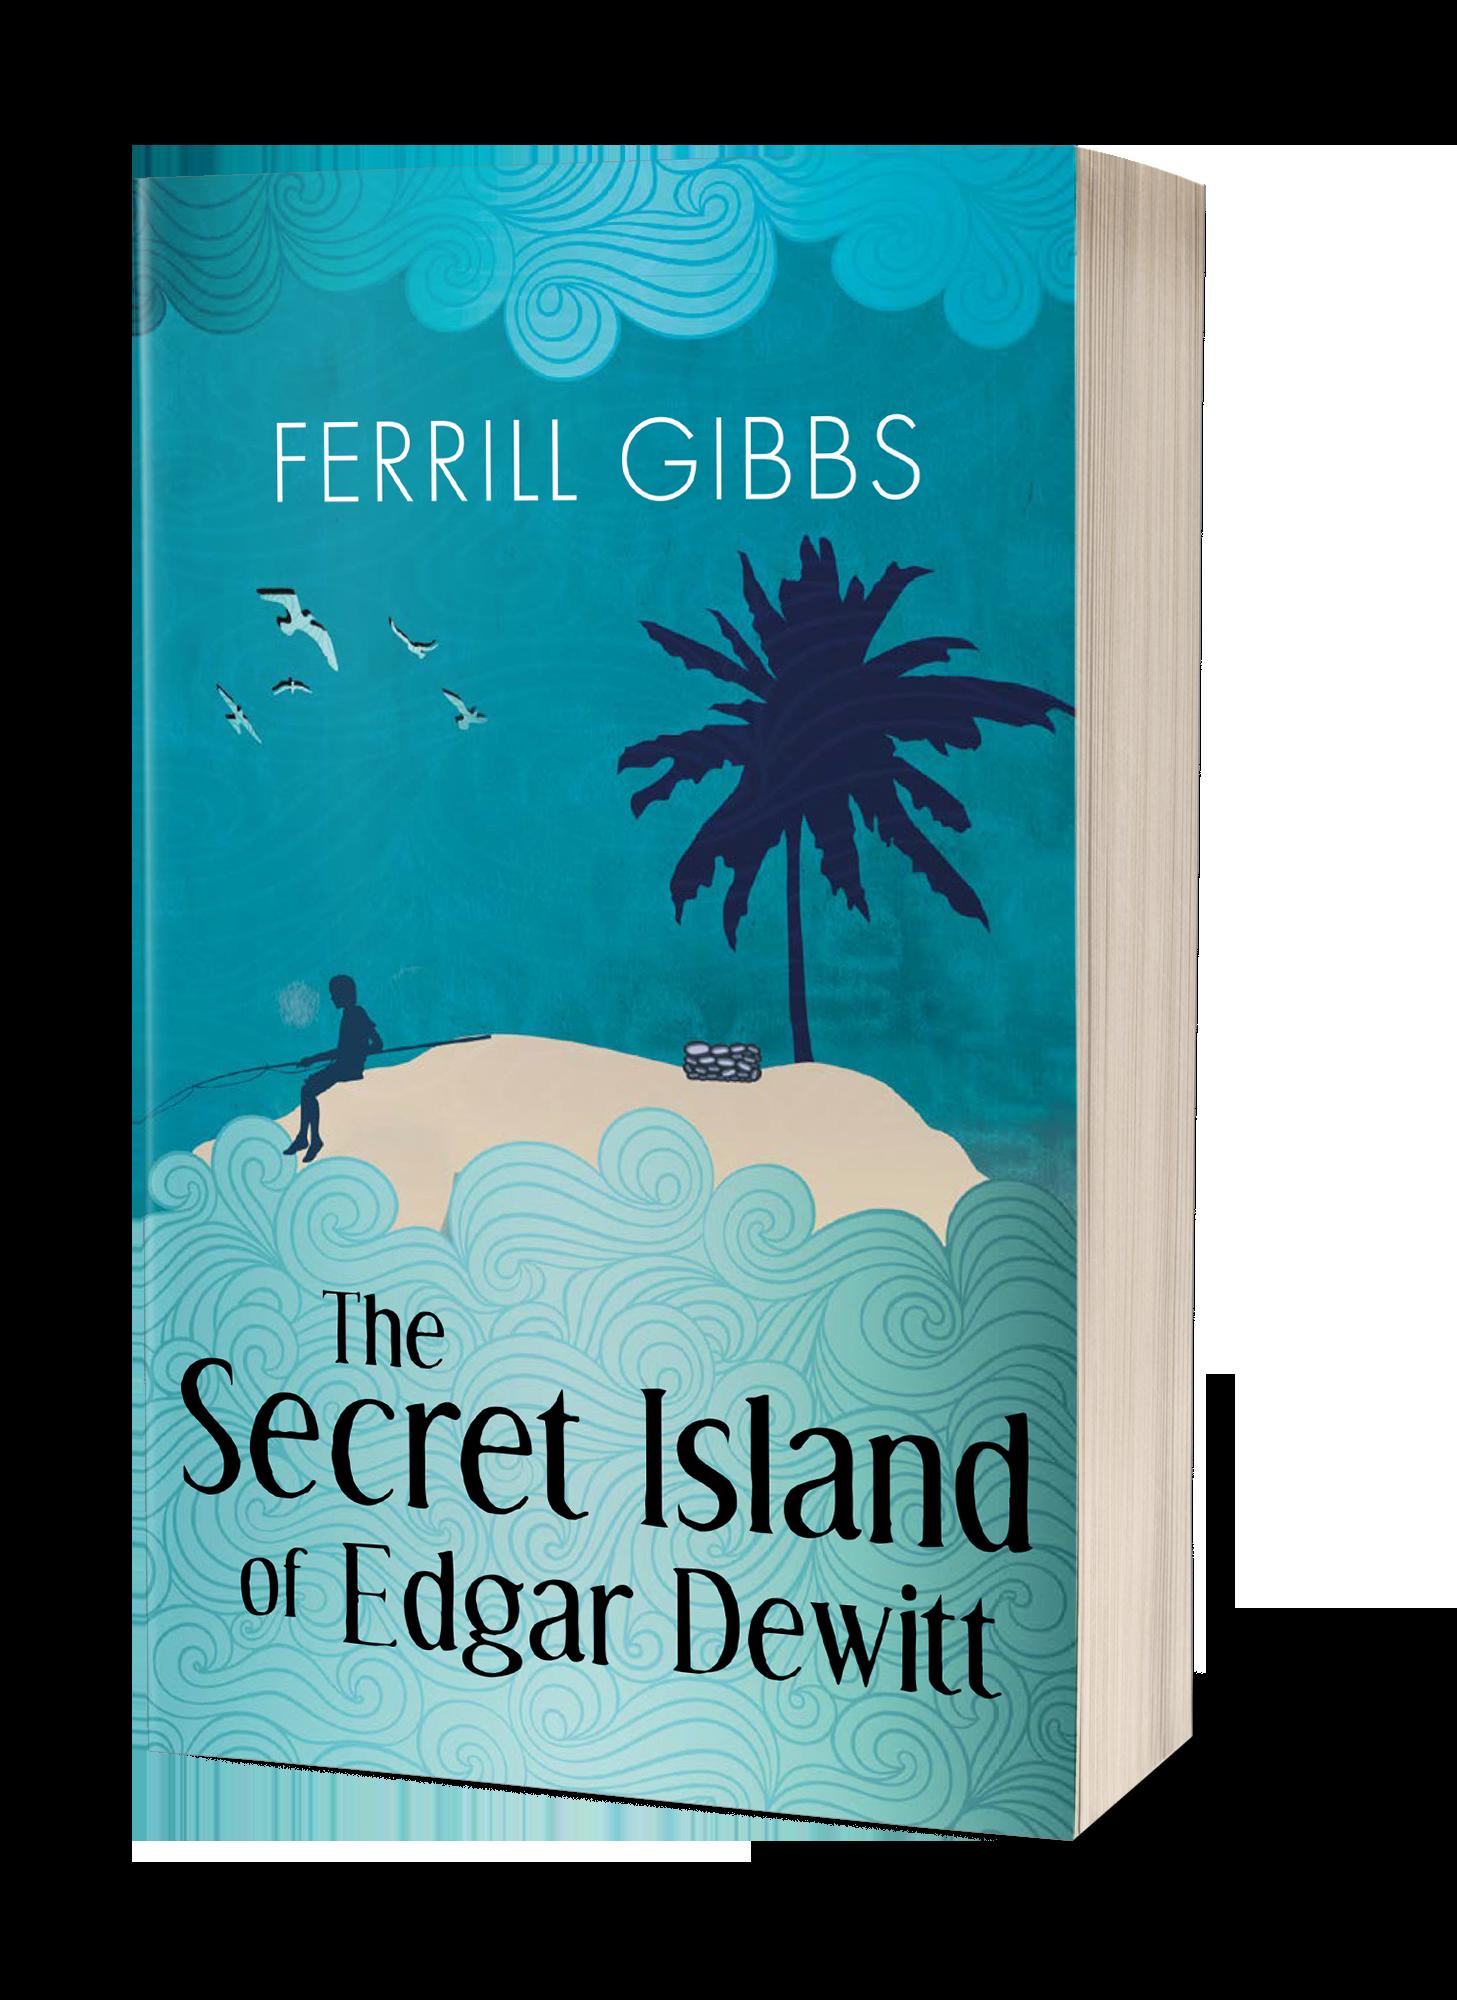 The Secret Island Of Edgar Dewitt book cover, blue background, water, island, sky, birds flying, boy fishing on island